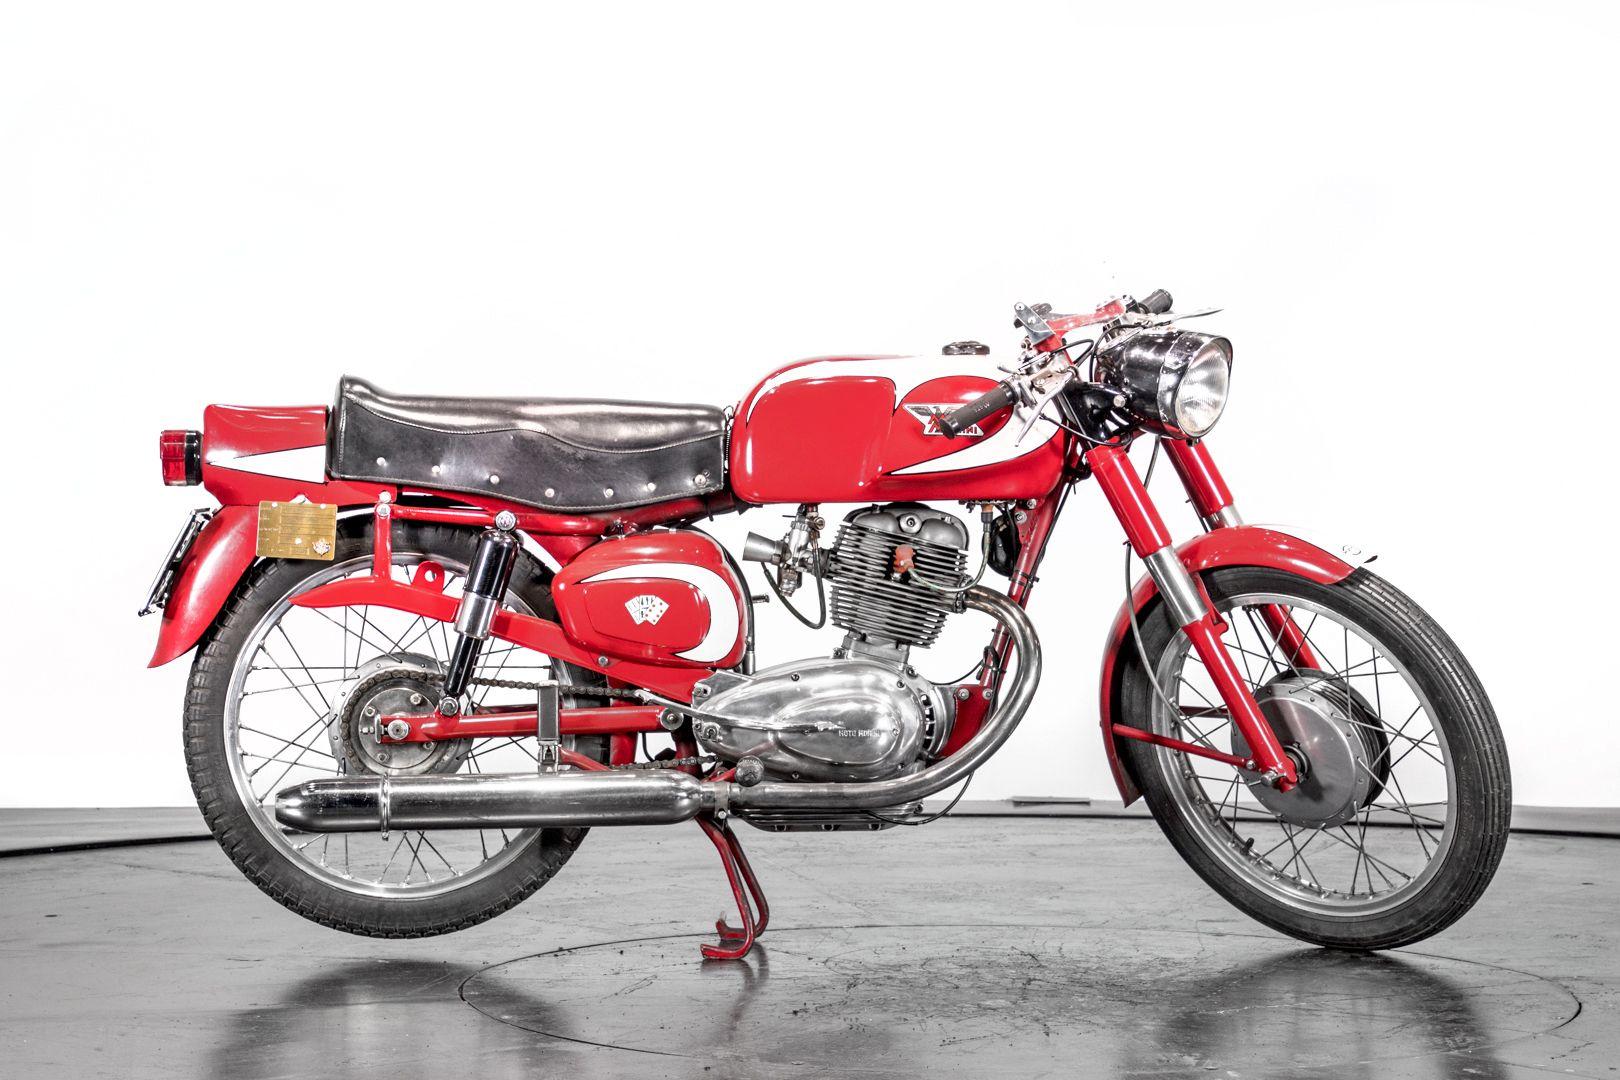 1957 Moto Morini 175 71738